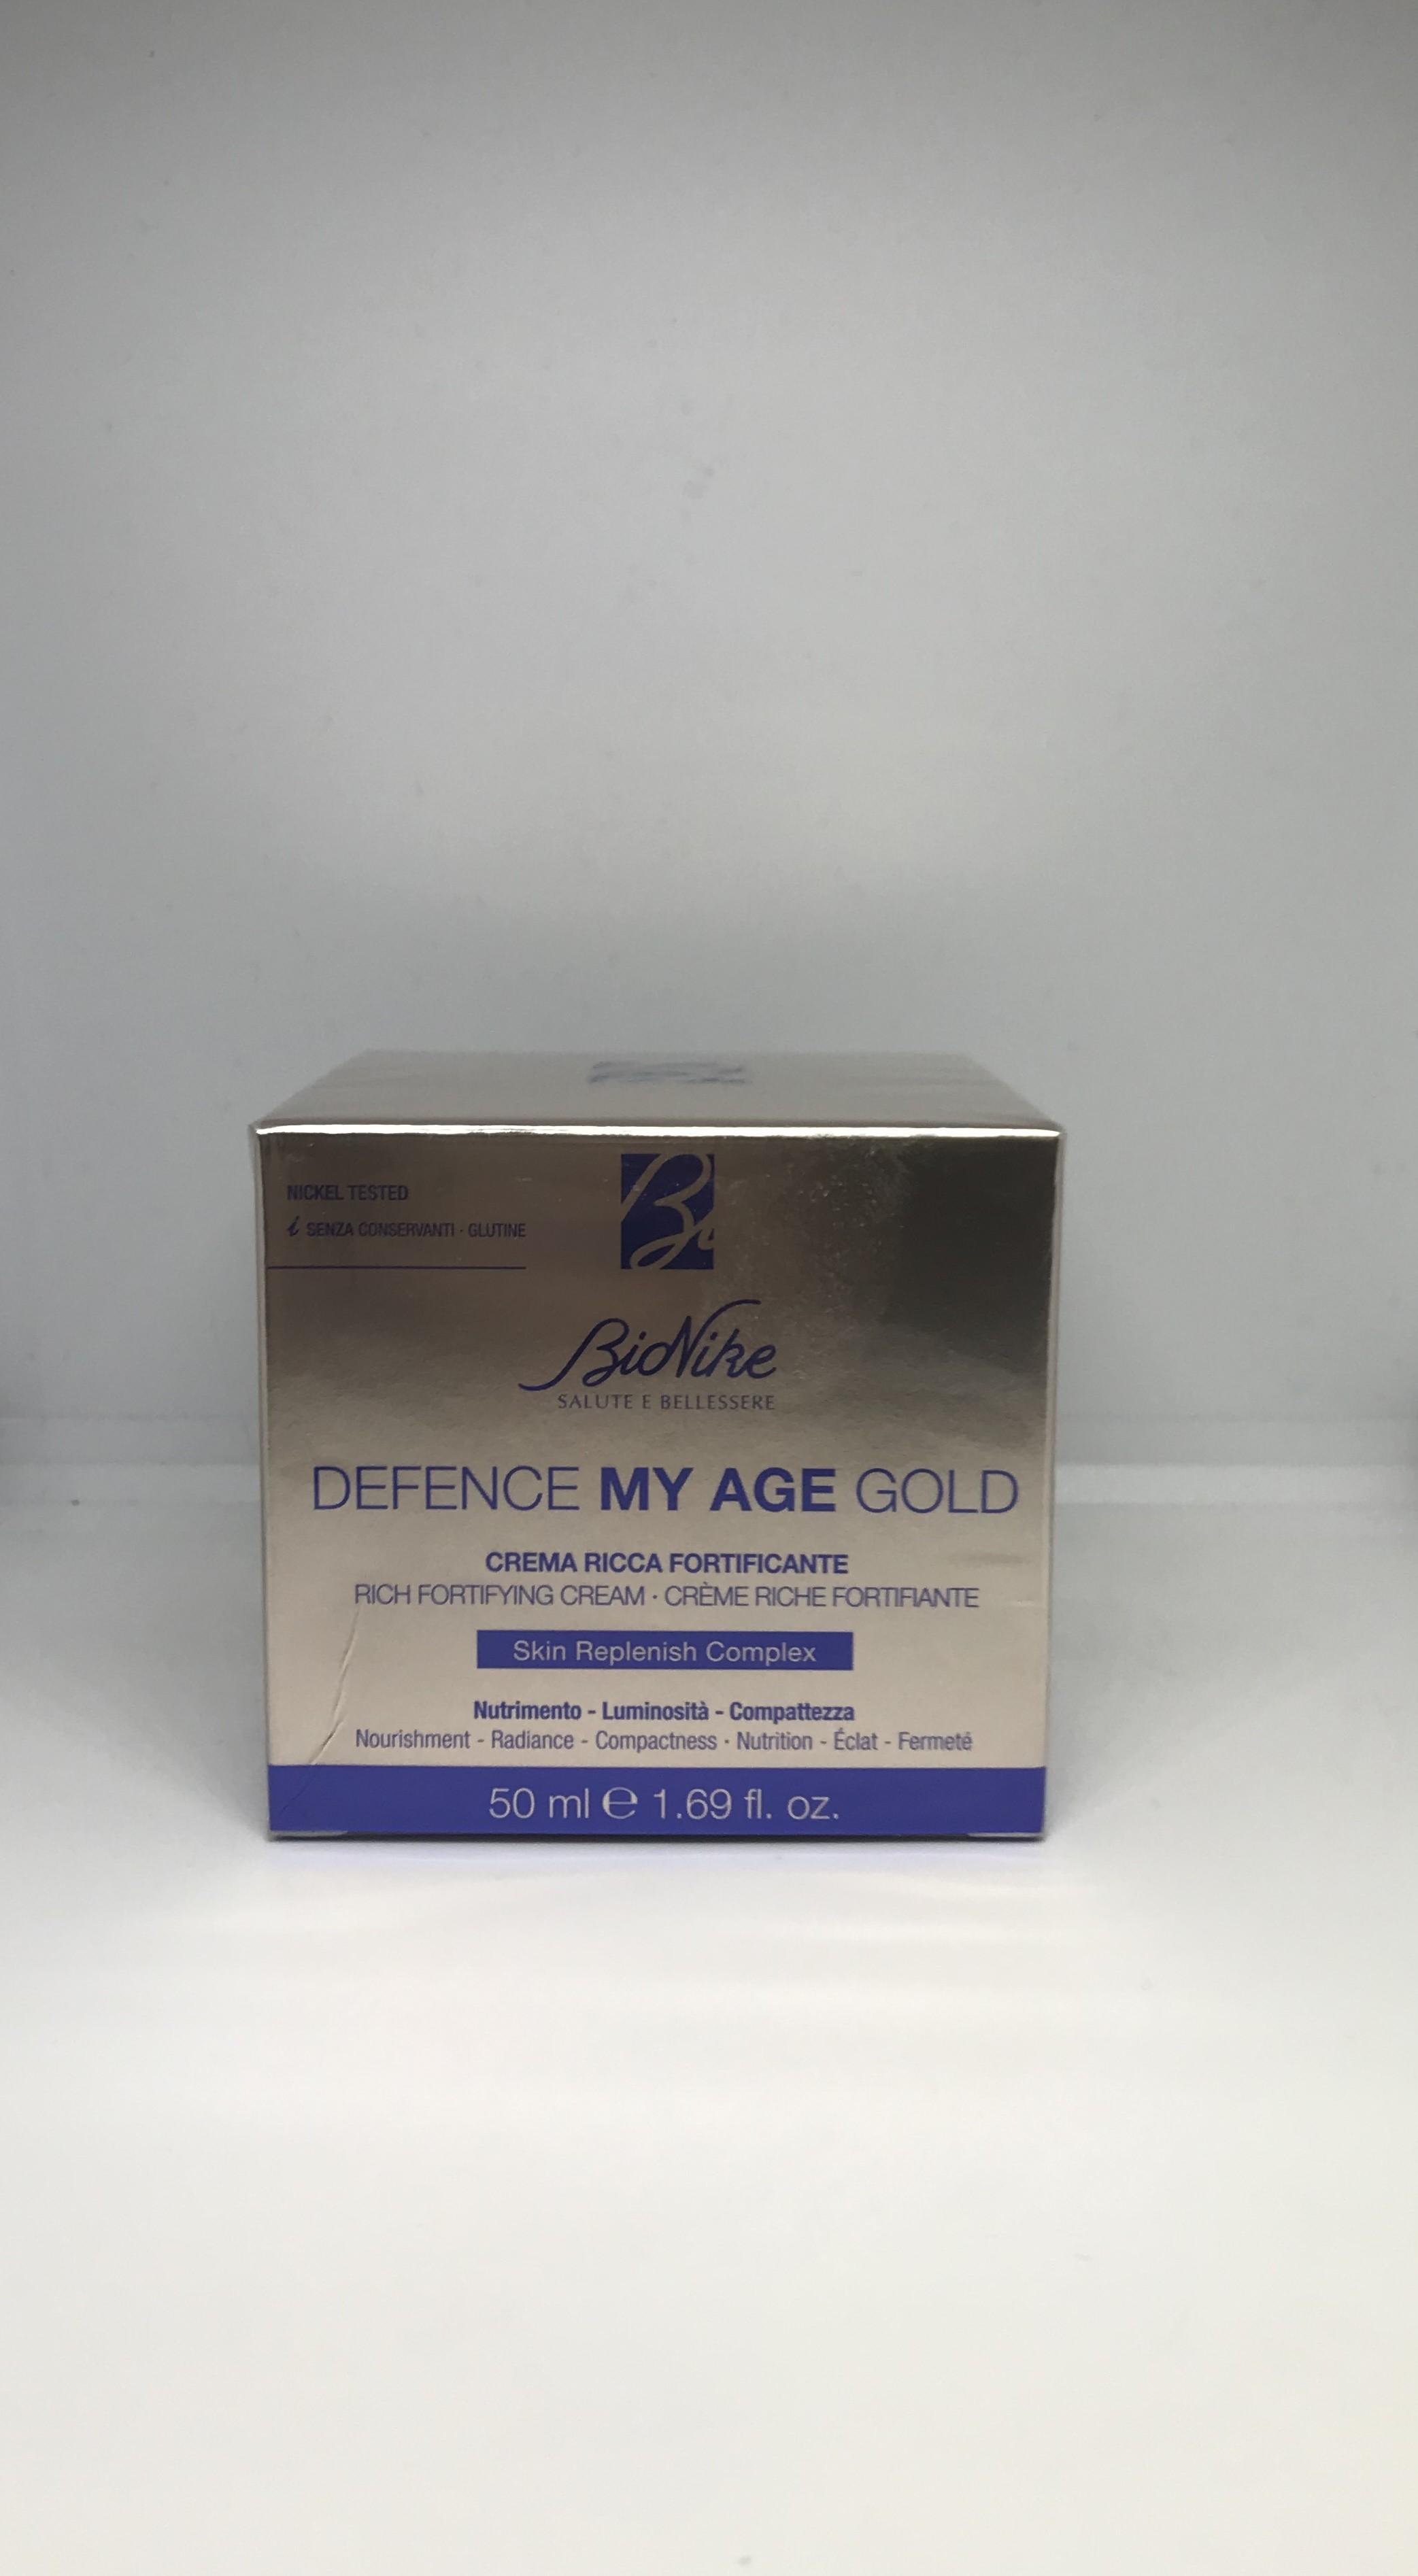 Bionike Defence My Age Gold Crema Fortificante Per Pelli Mature 50ml